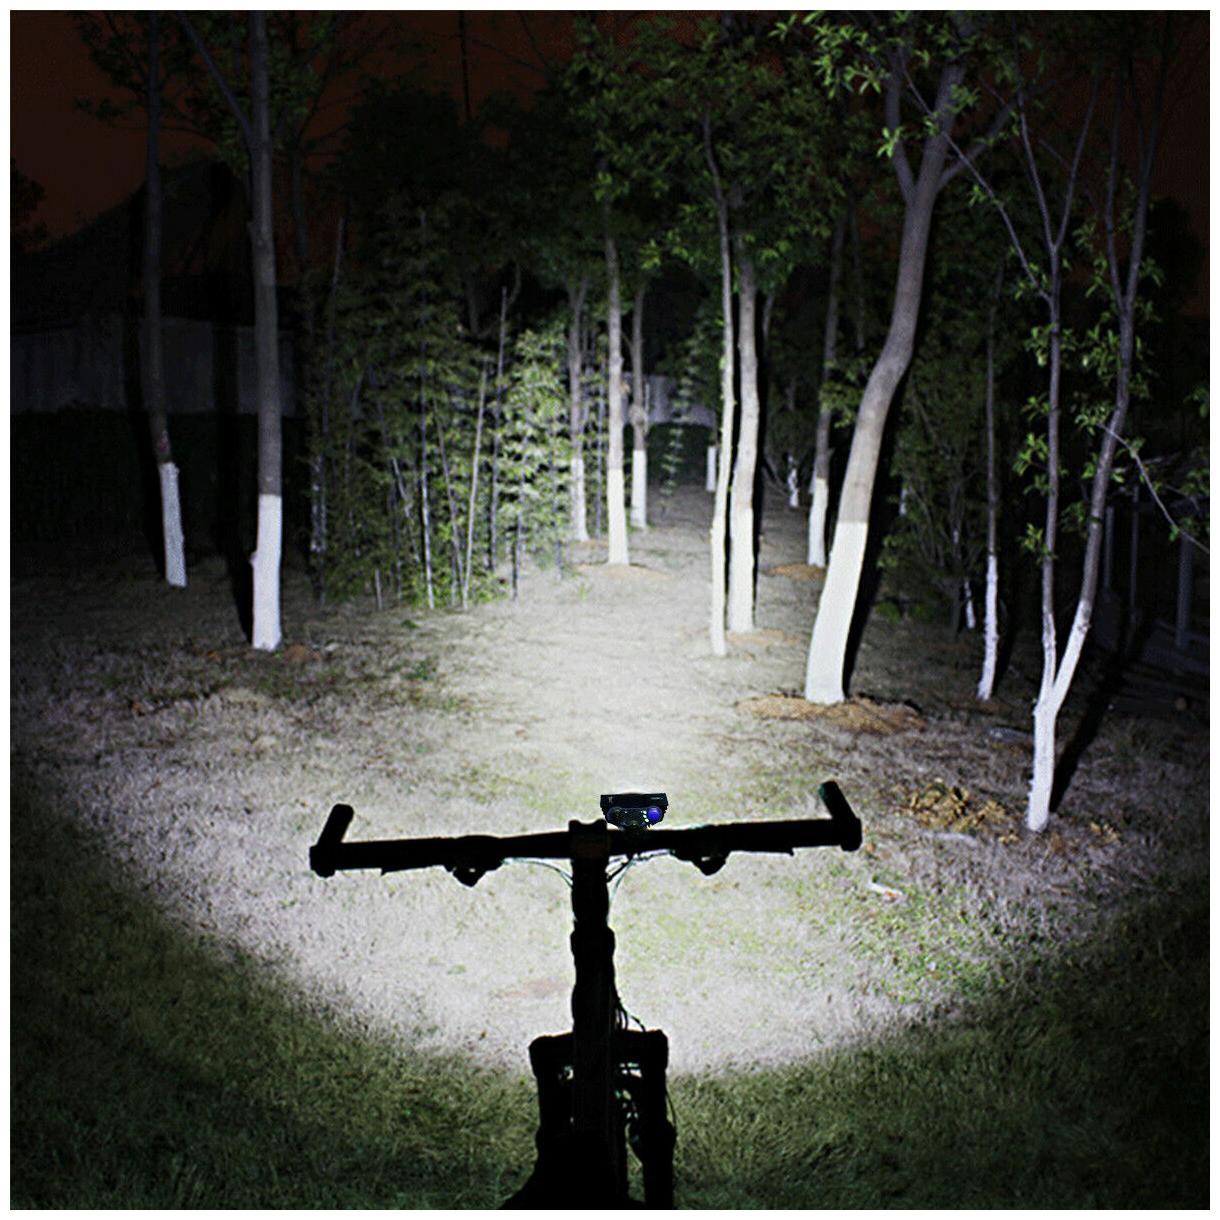 3 x CREE XM-L T6 LED Bicycle bike HeadLight Head Light Lamp Torch Flashlight US